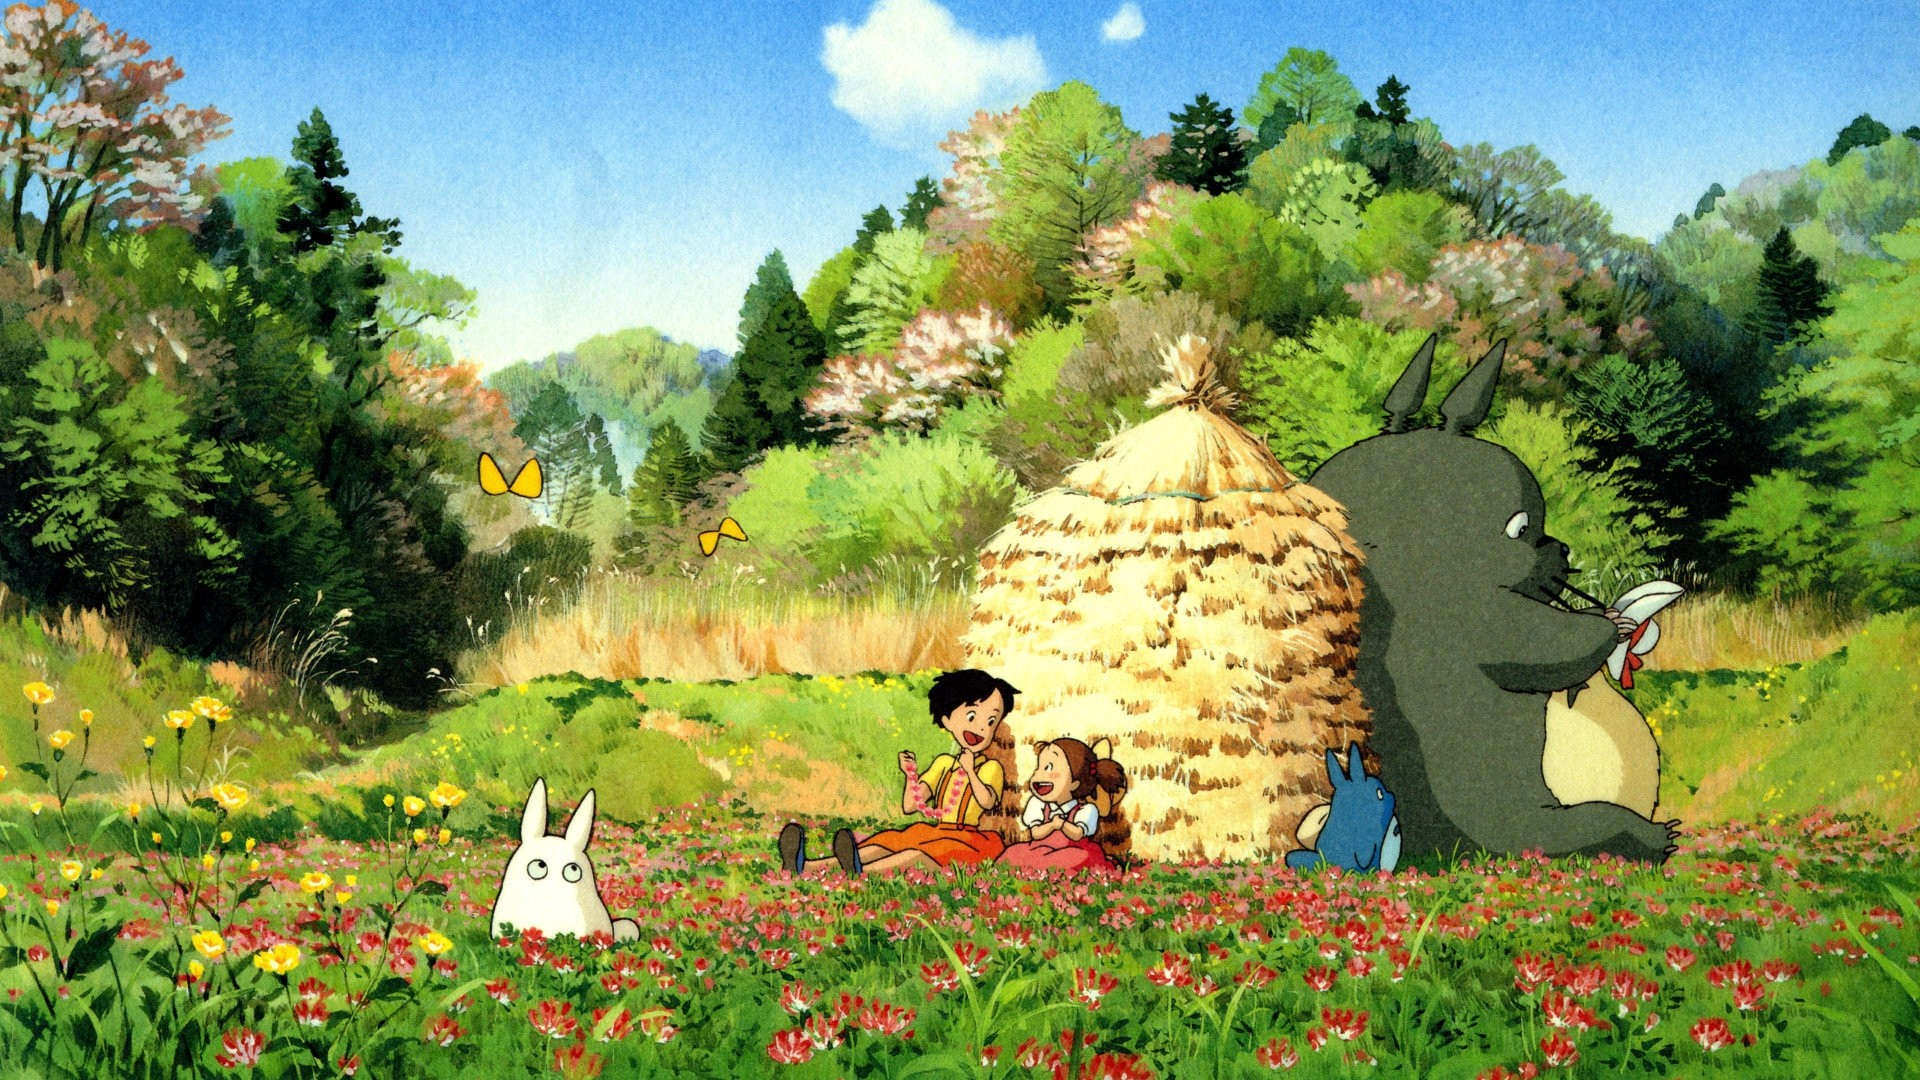 Ghibli Image